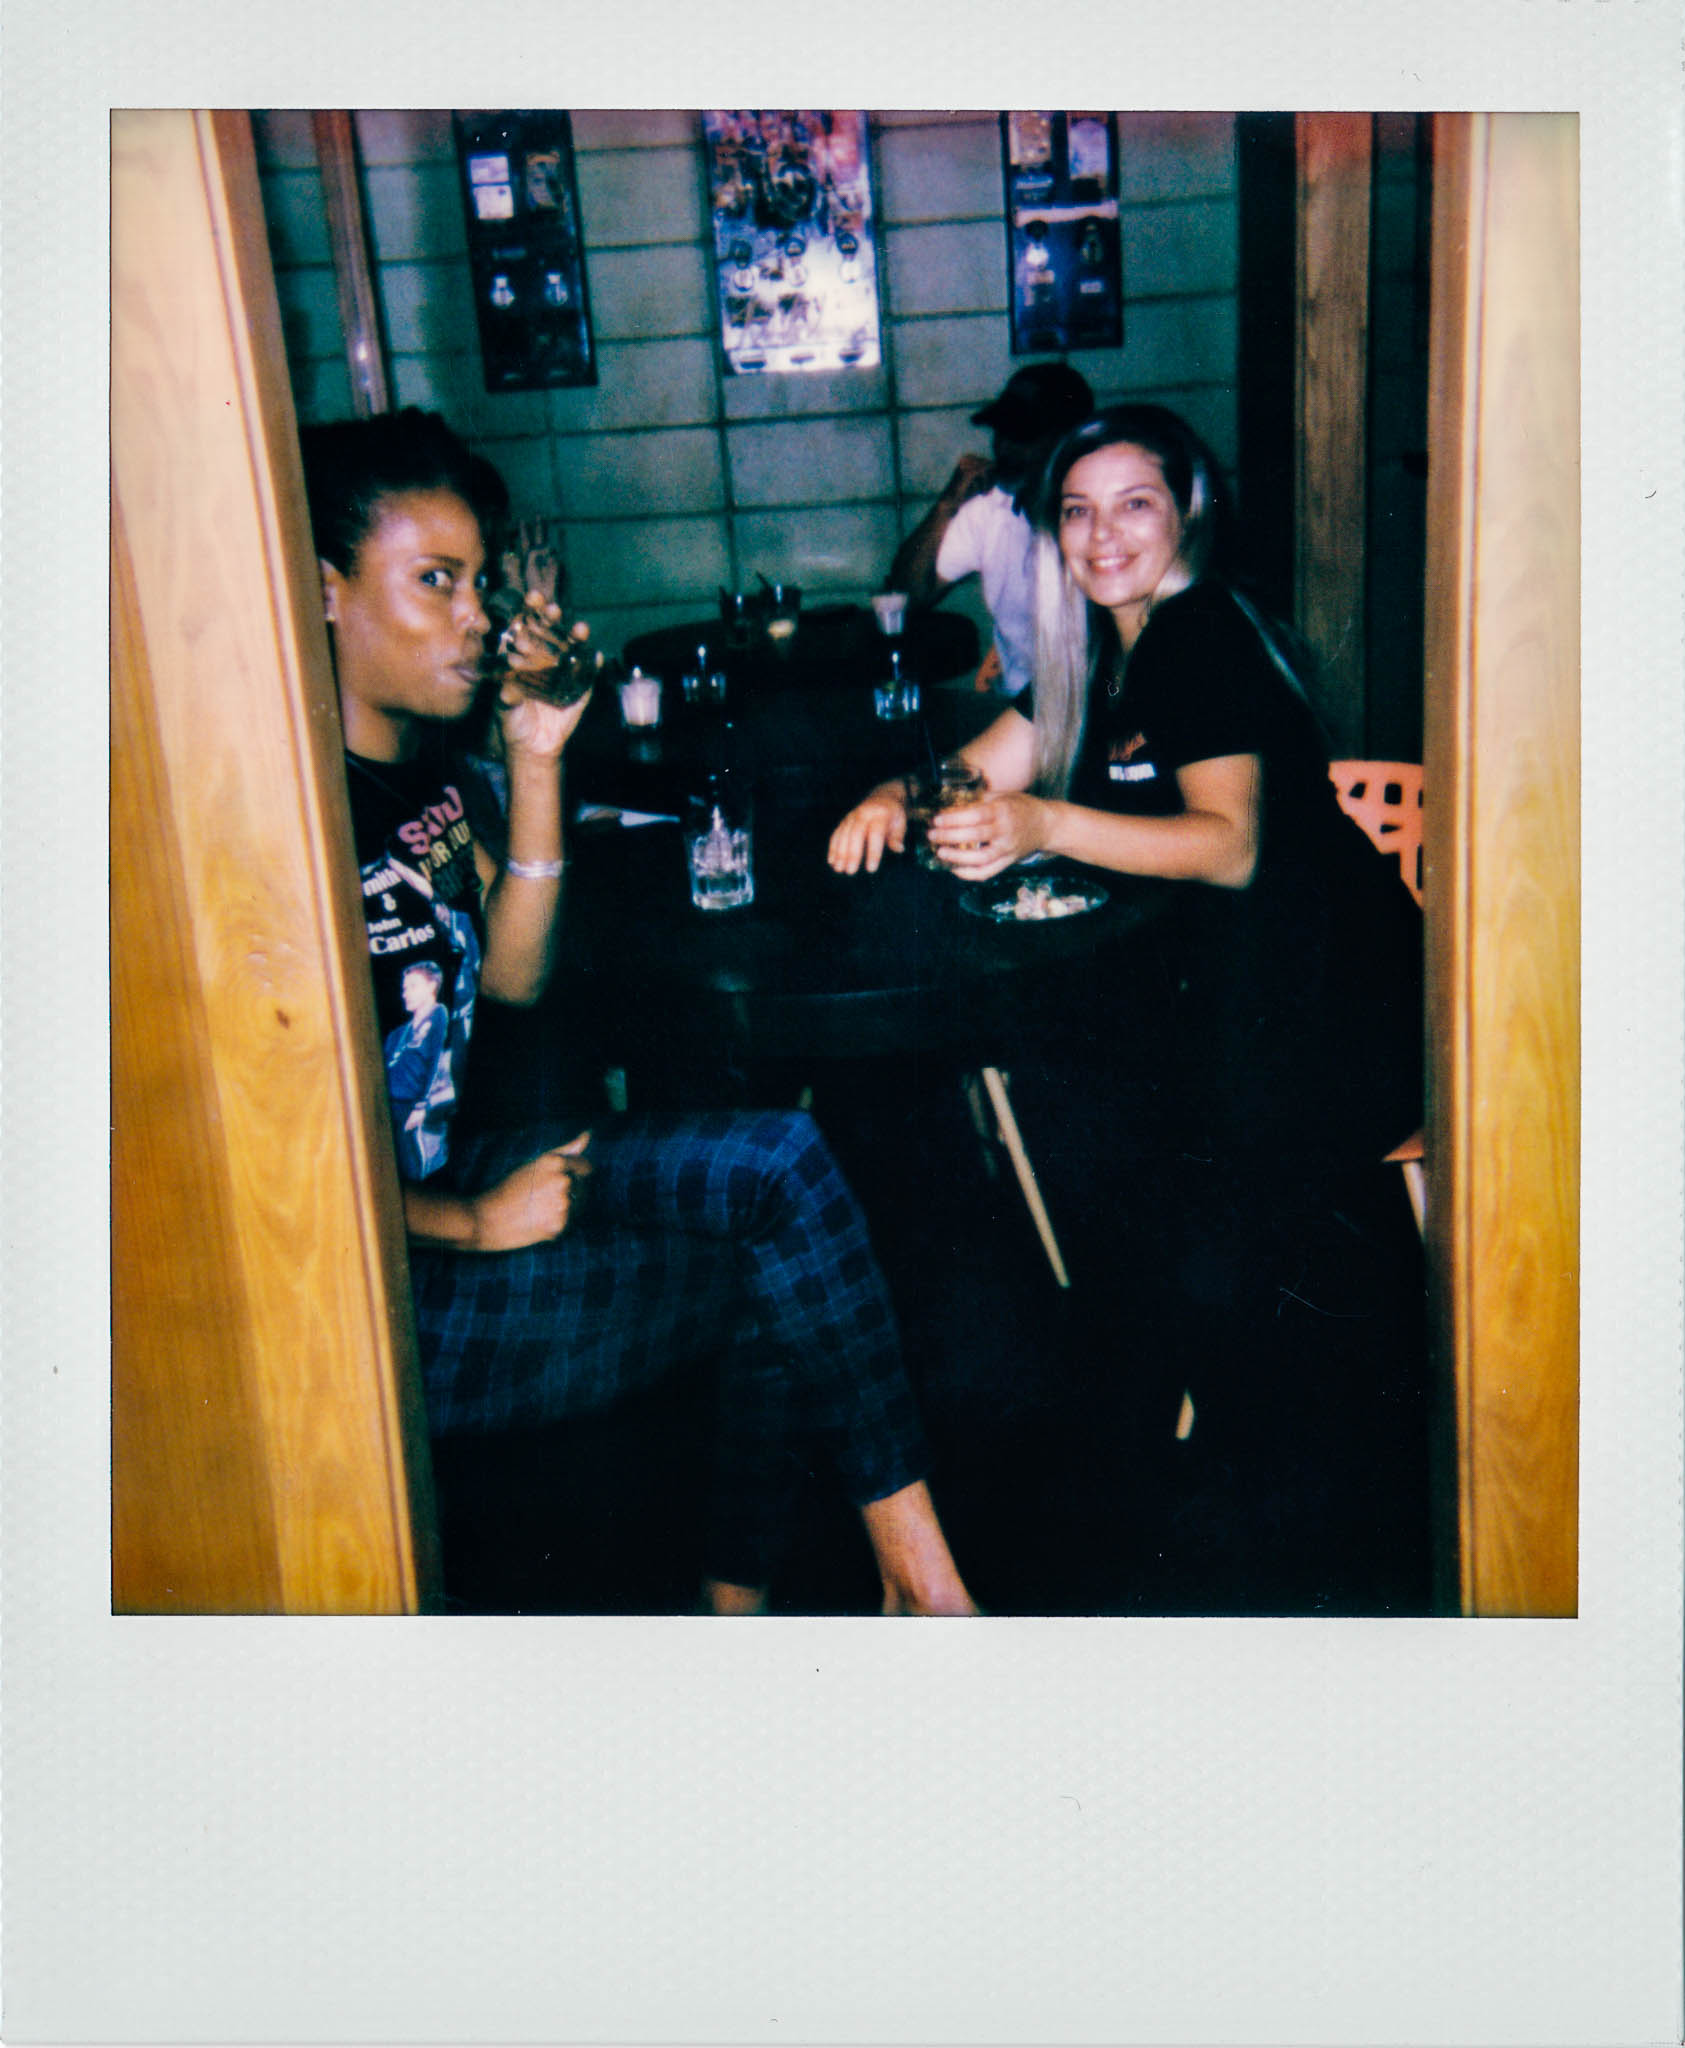 customers-drinking-wallys-polaroid-2.jpg